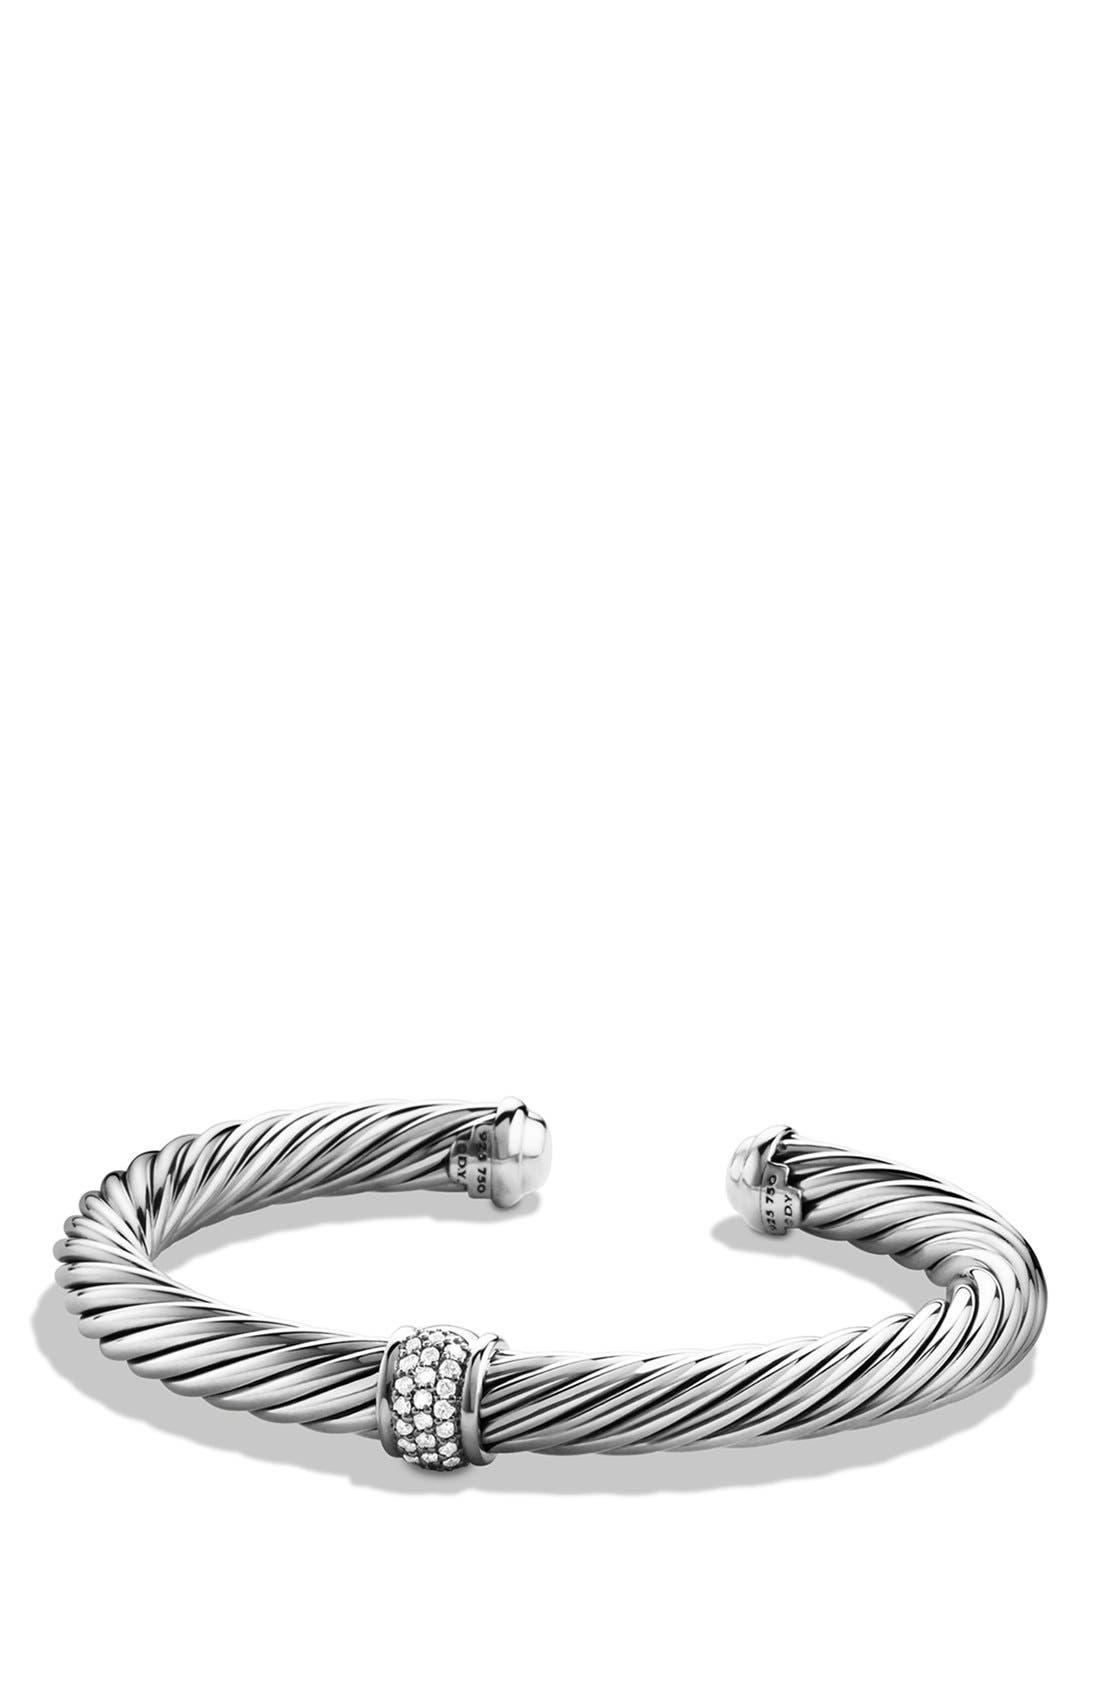 DAVID YURMAN 'Cable Classics' Bracelet with Diamonds and